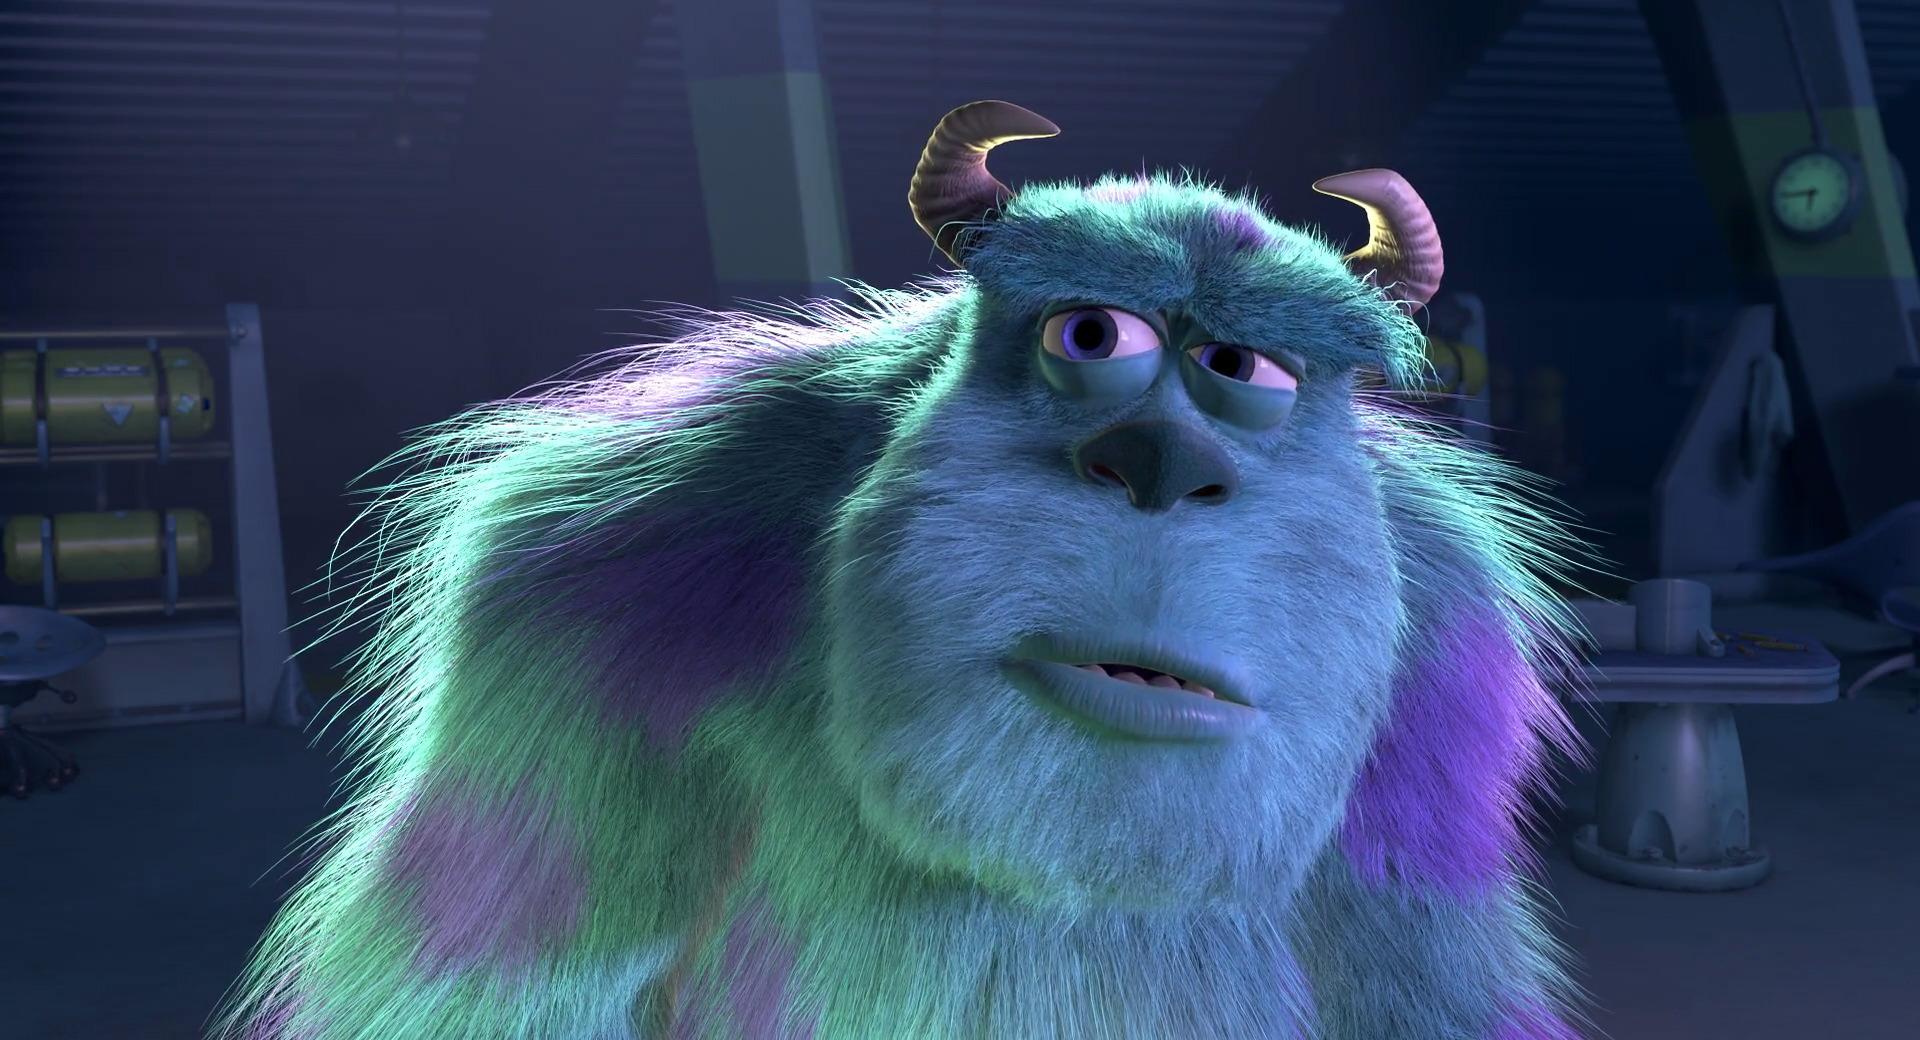 jacques p sulli sullivent personnage dans monstres cie pixar planet fr. Black Bedroom Furniture Sets. Home Design Ideas